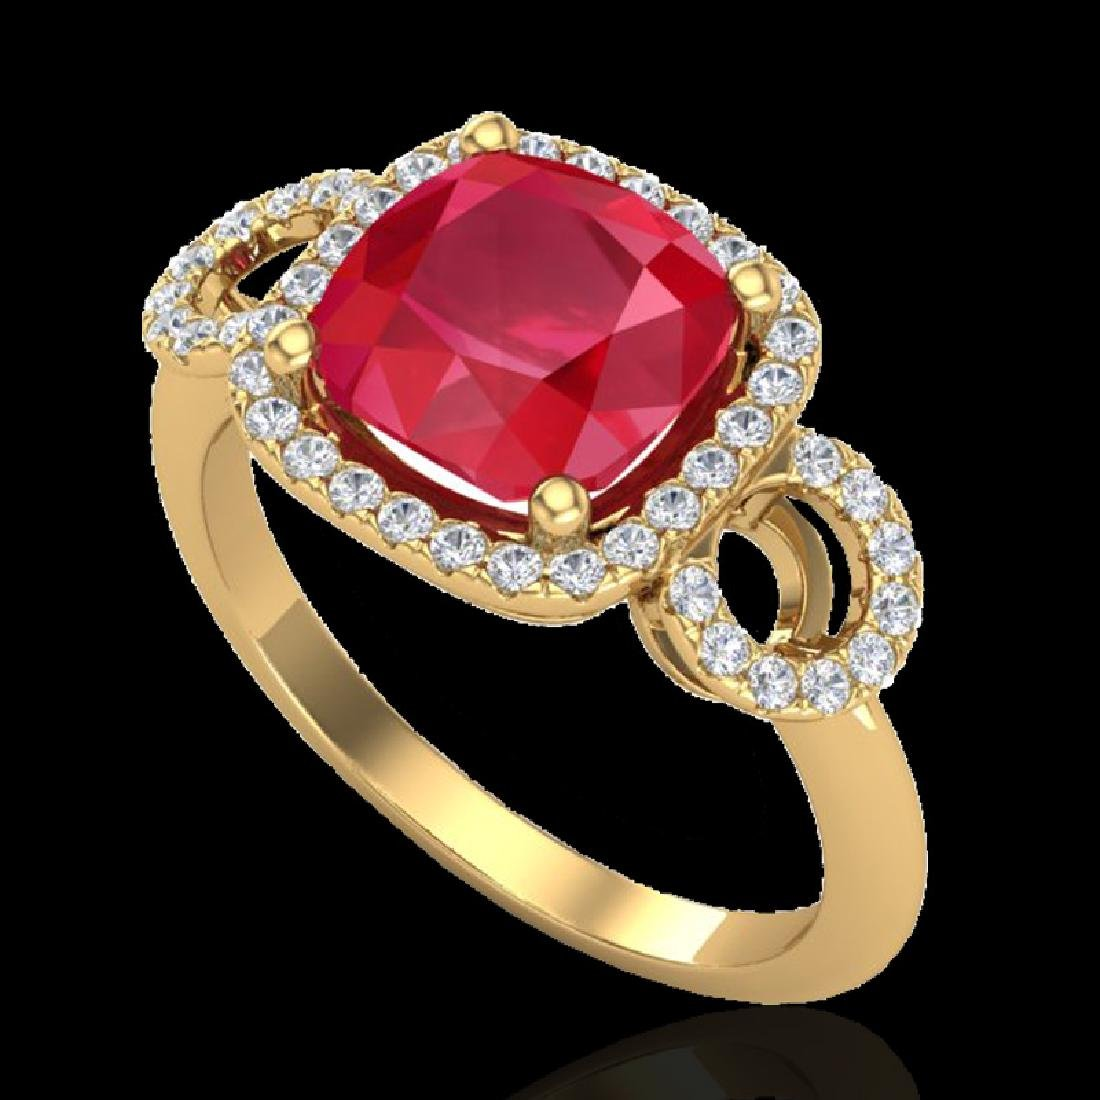 3.15 CTW Ruby & Micro VS/SI Diamond Ring 18K Yellow - 2